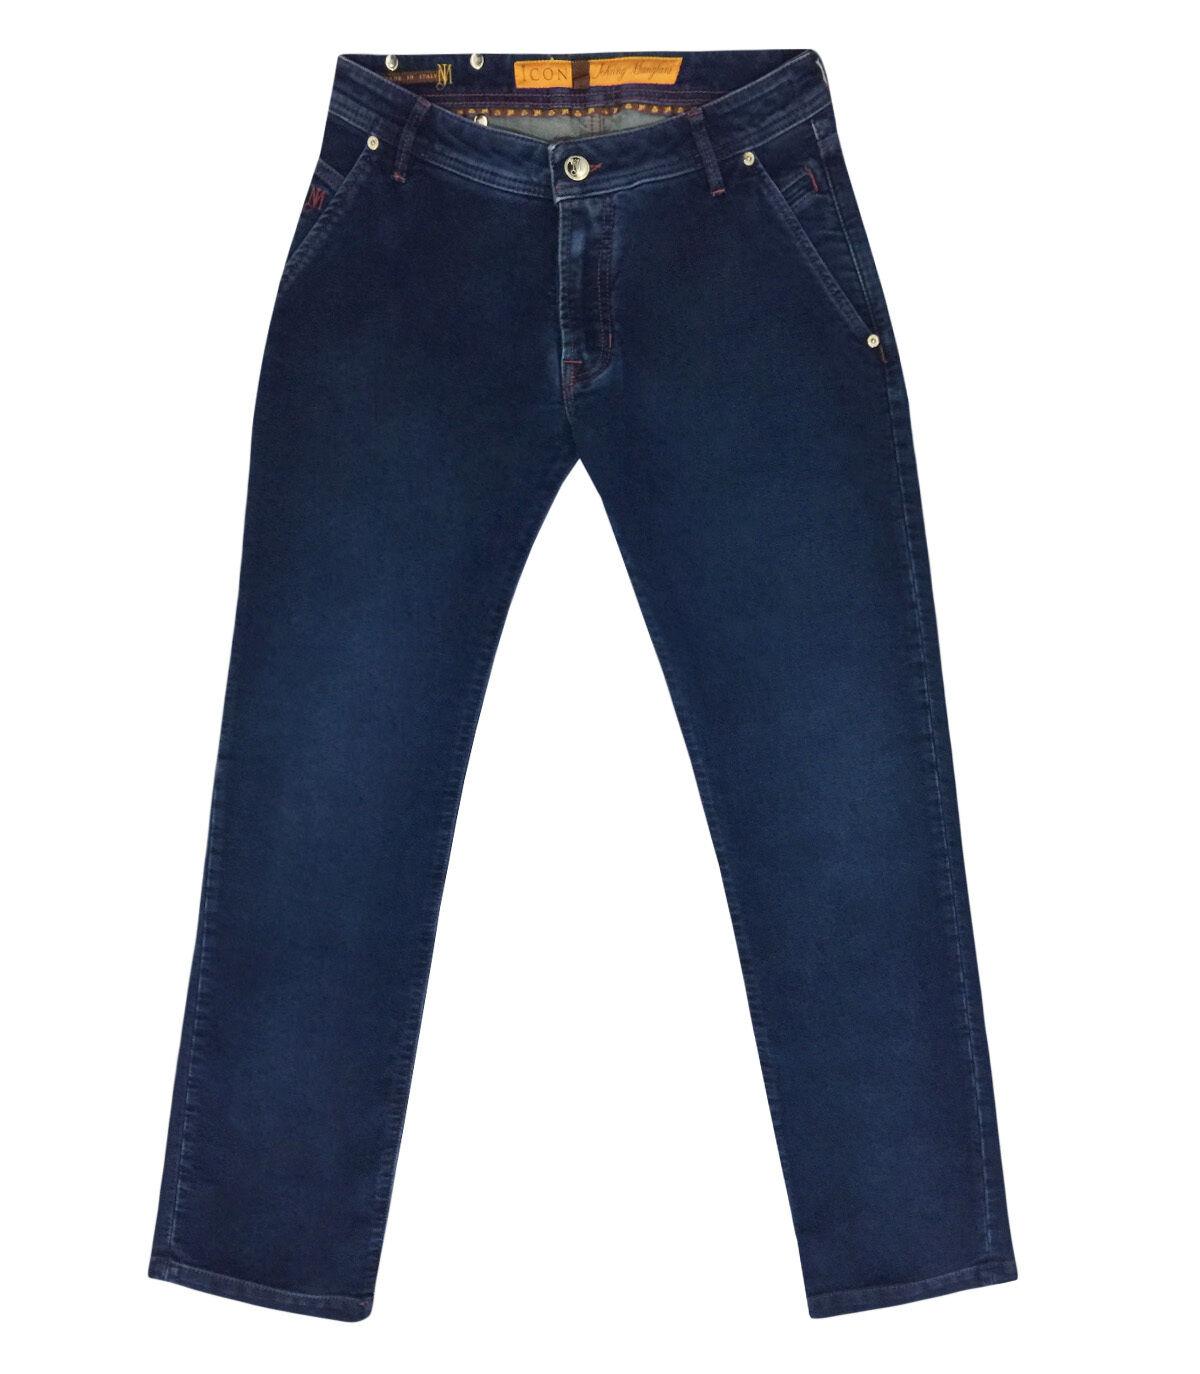 JM Icon Men's bluee Cotton Jeans Regular fit with Logo patch, size 40,42,44